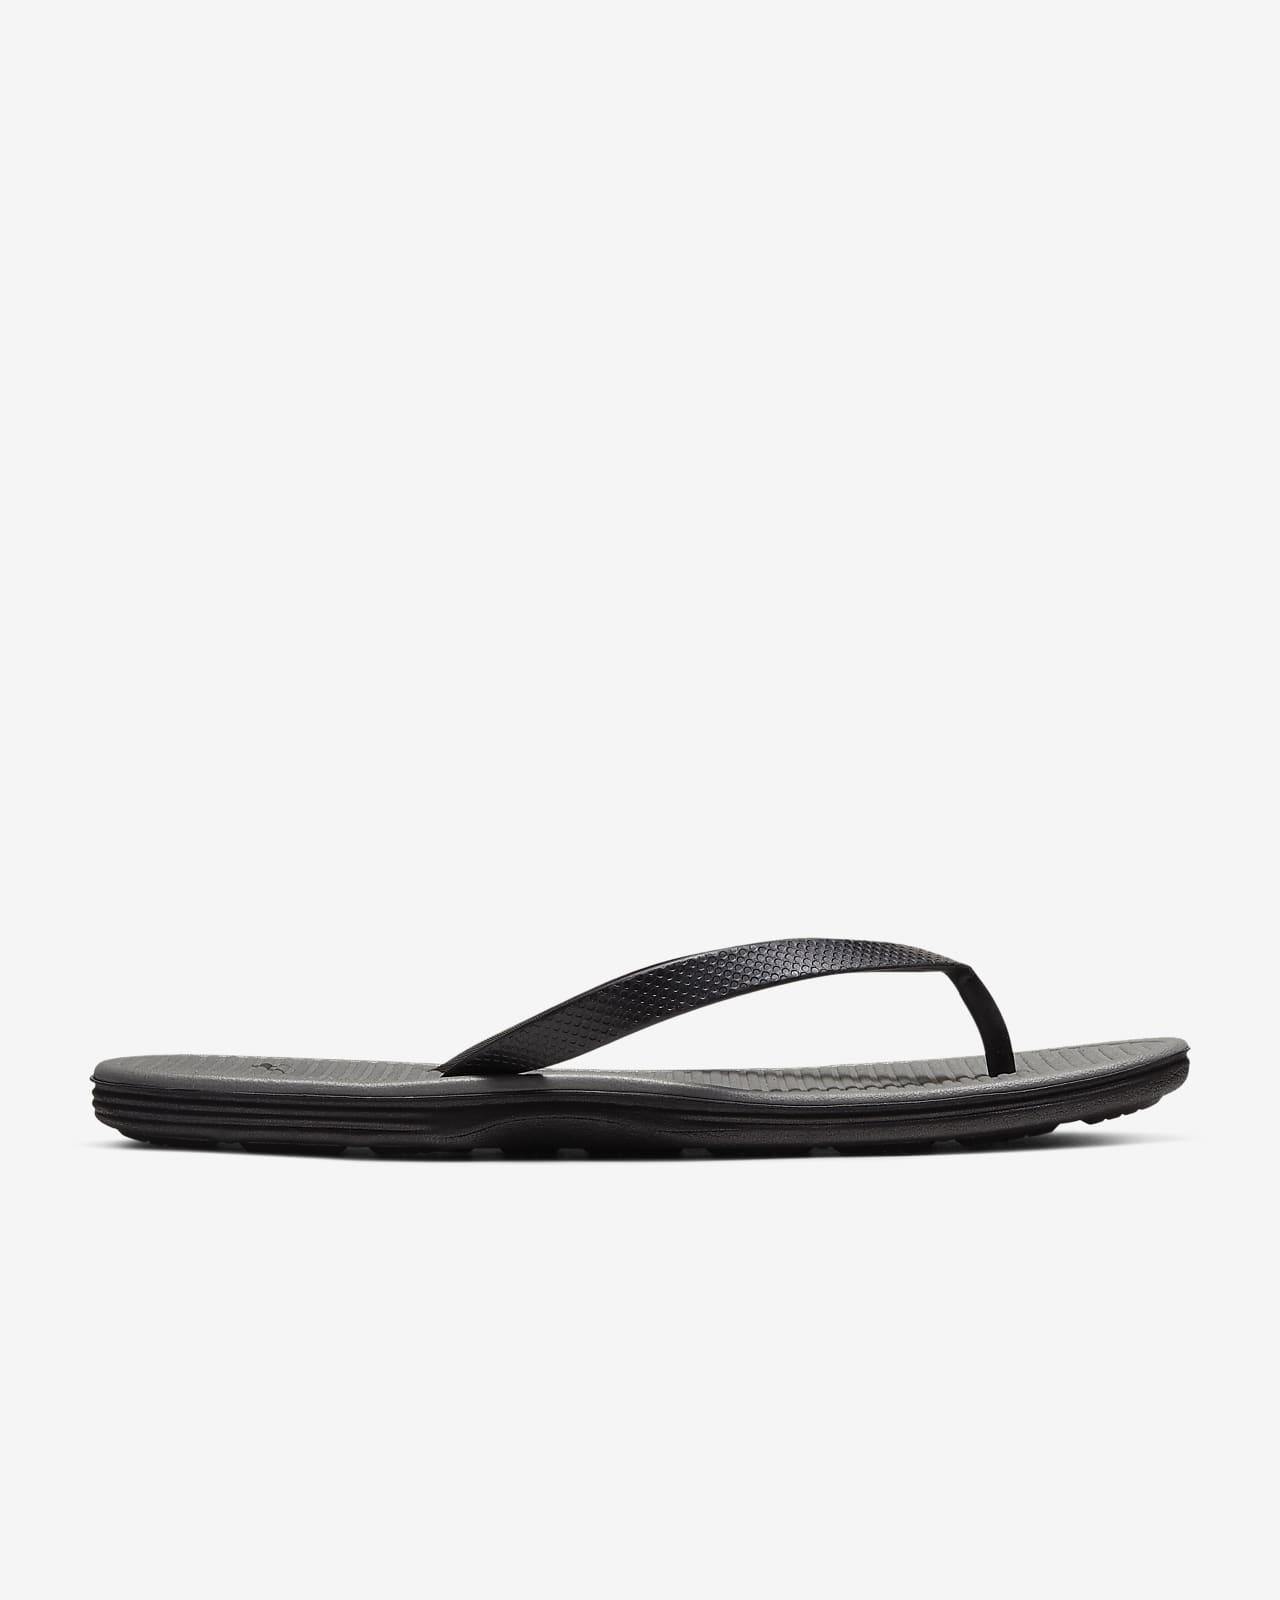 nike flip flops soft